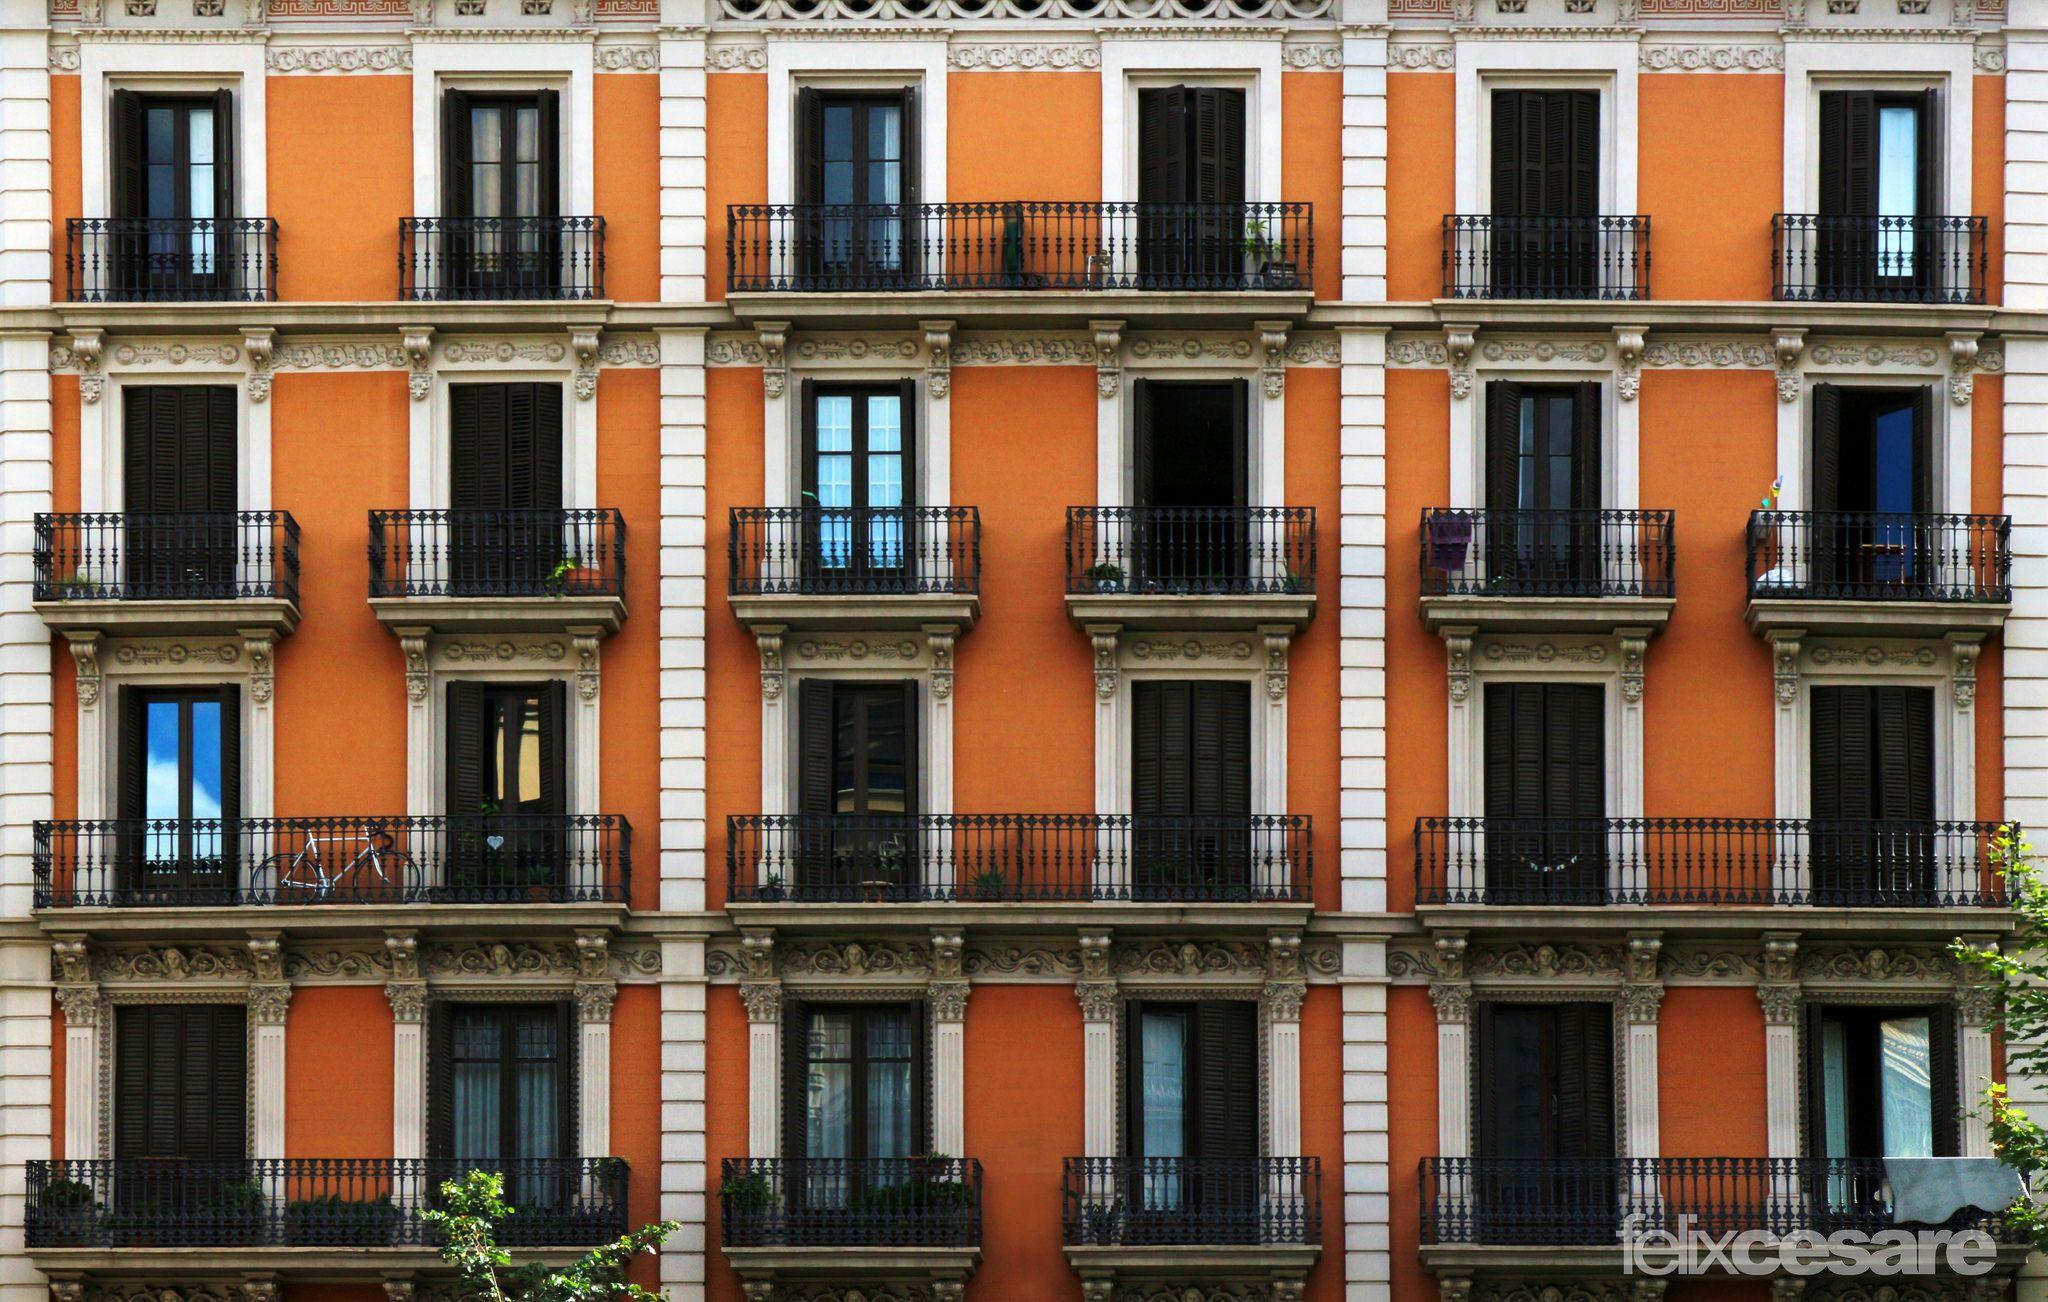 Barcelona Apartments Architectural, Spain | Barcelona ...